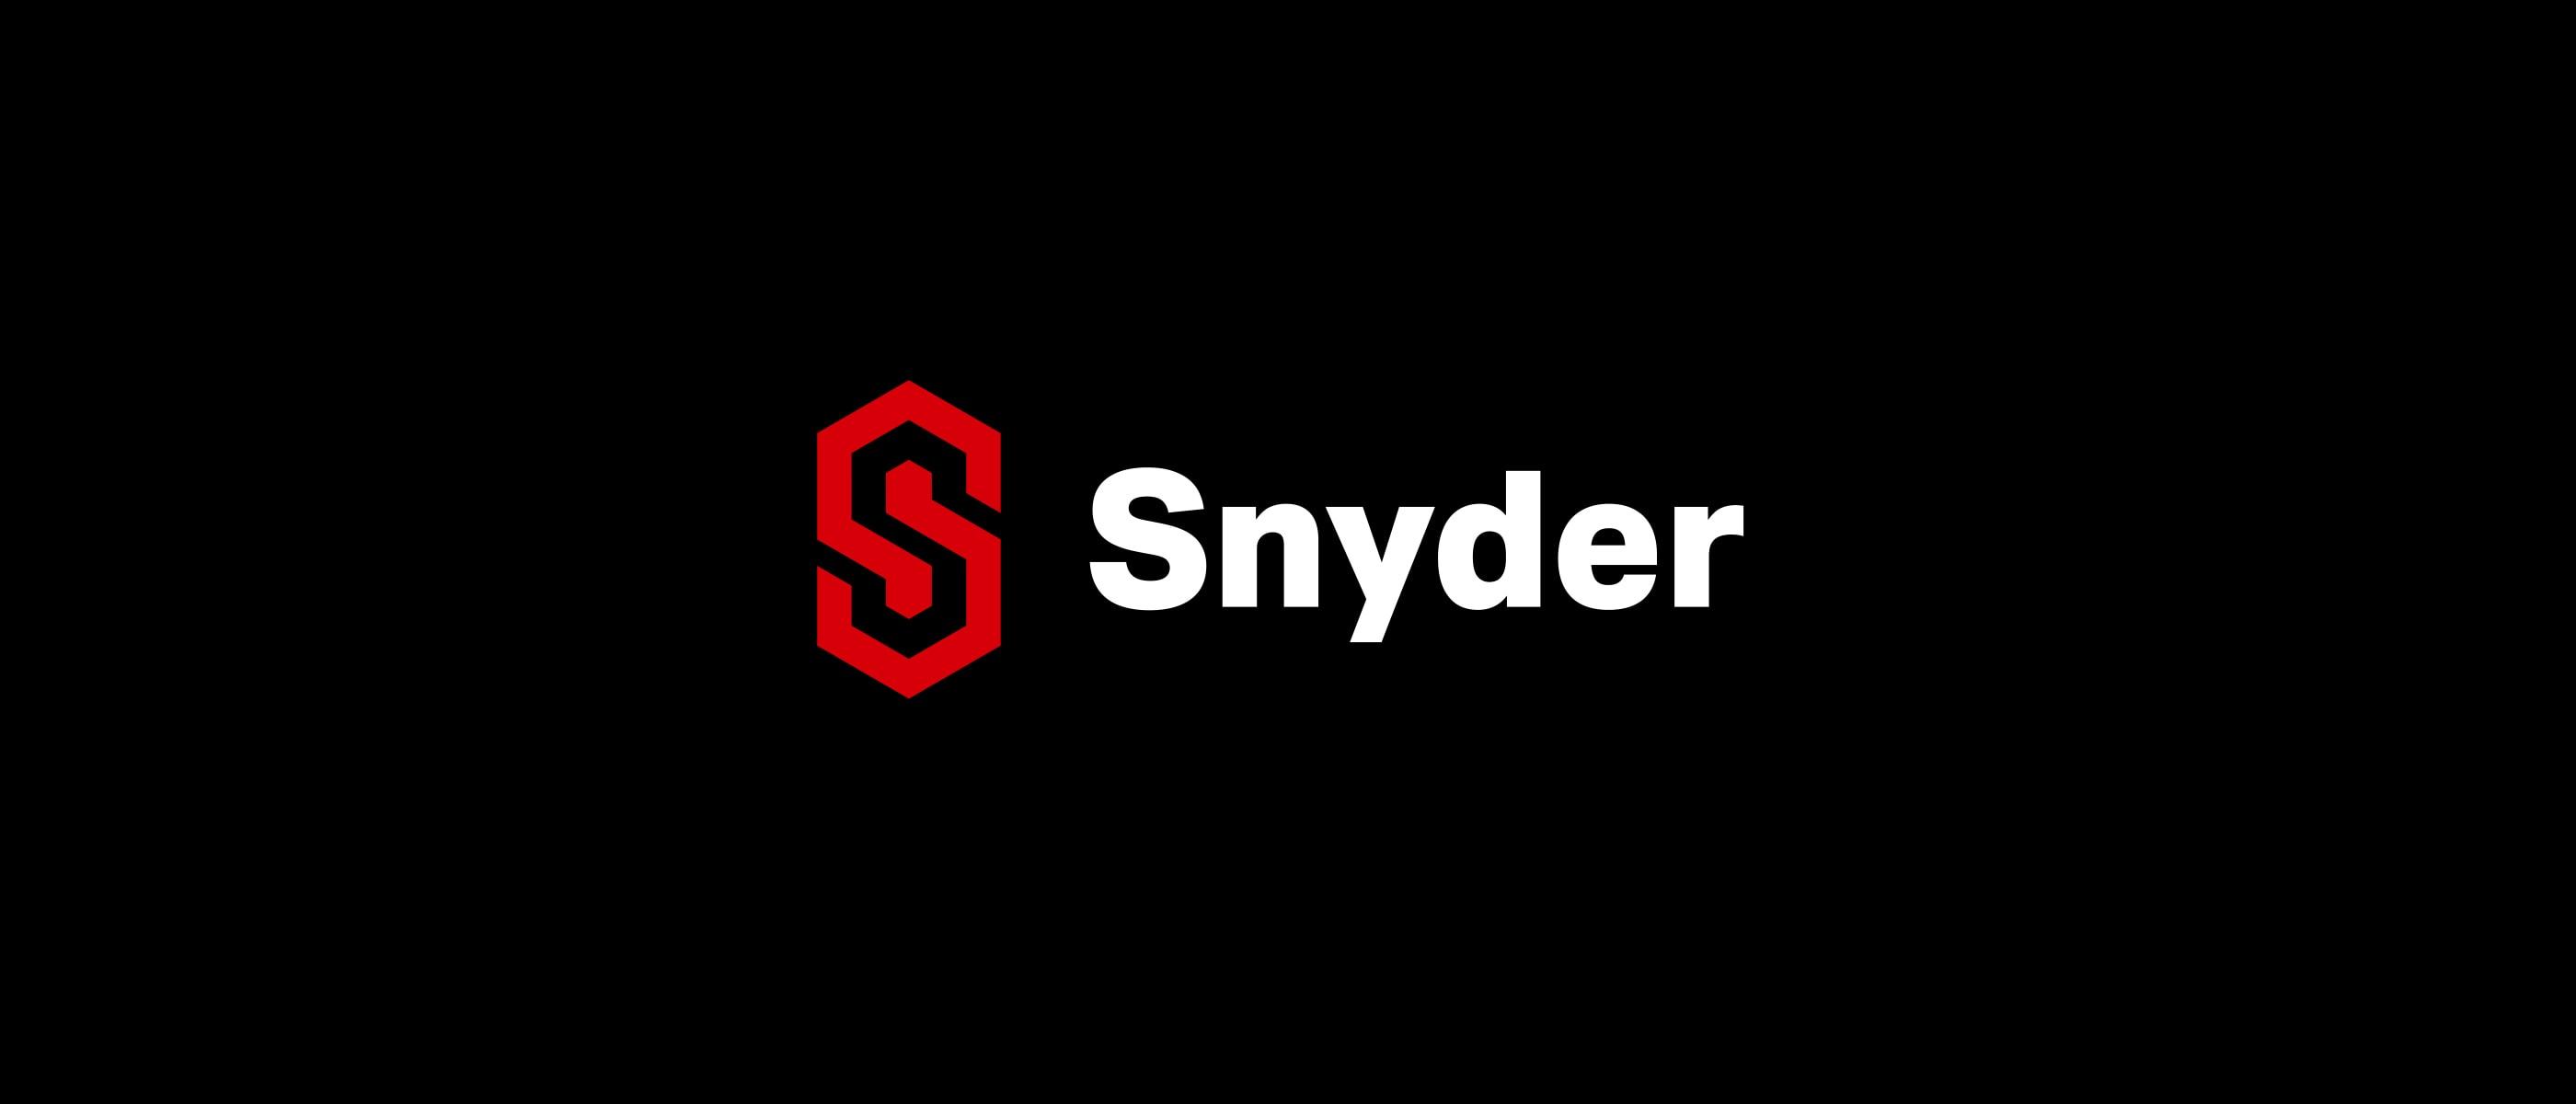 Snyder Trademark Reversed